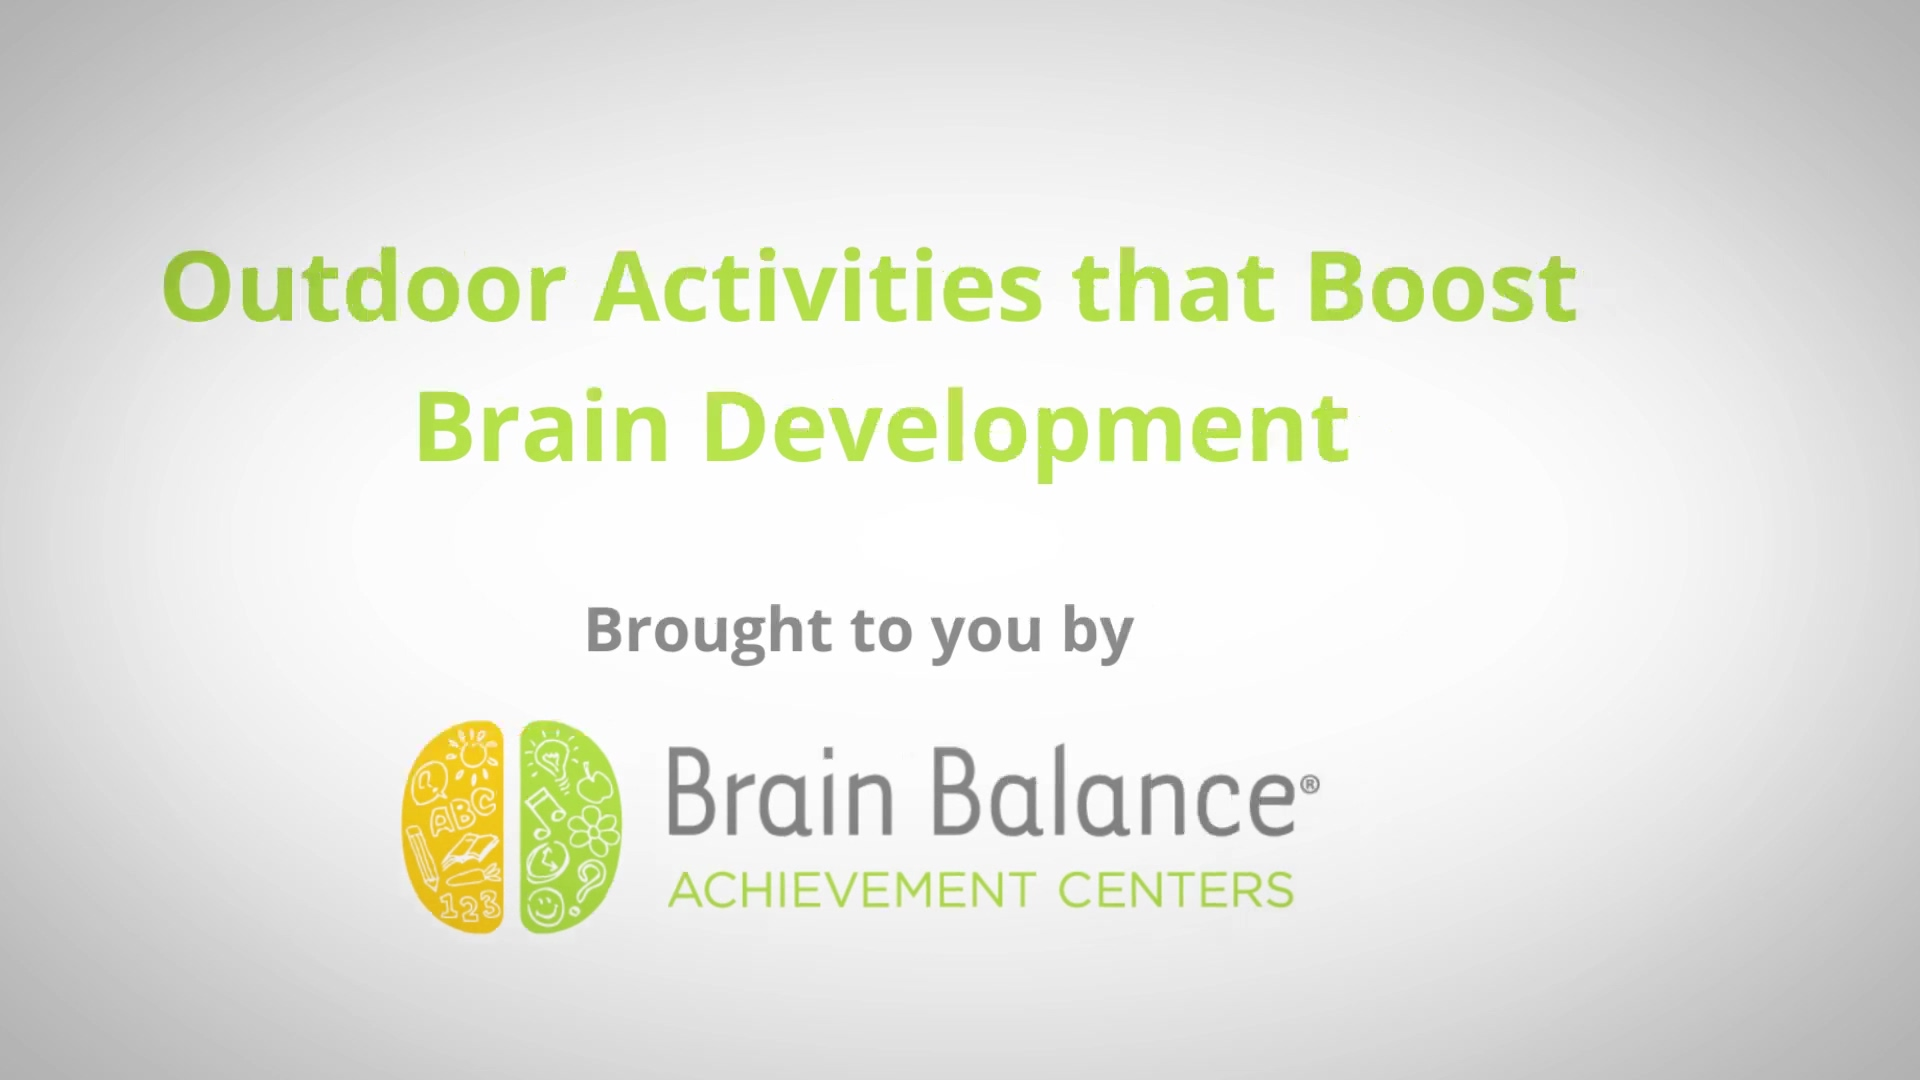 Brain Balance Achievement Centers — Outdoor activities